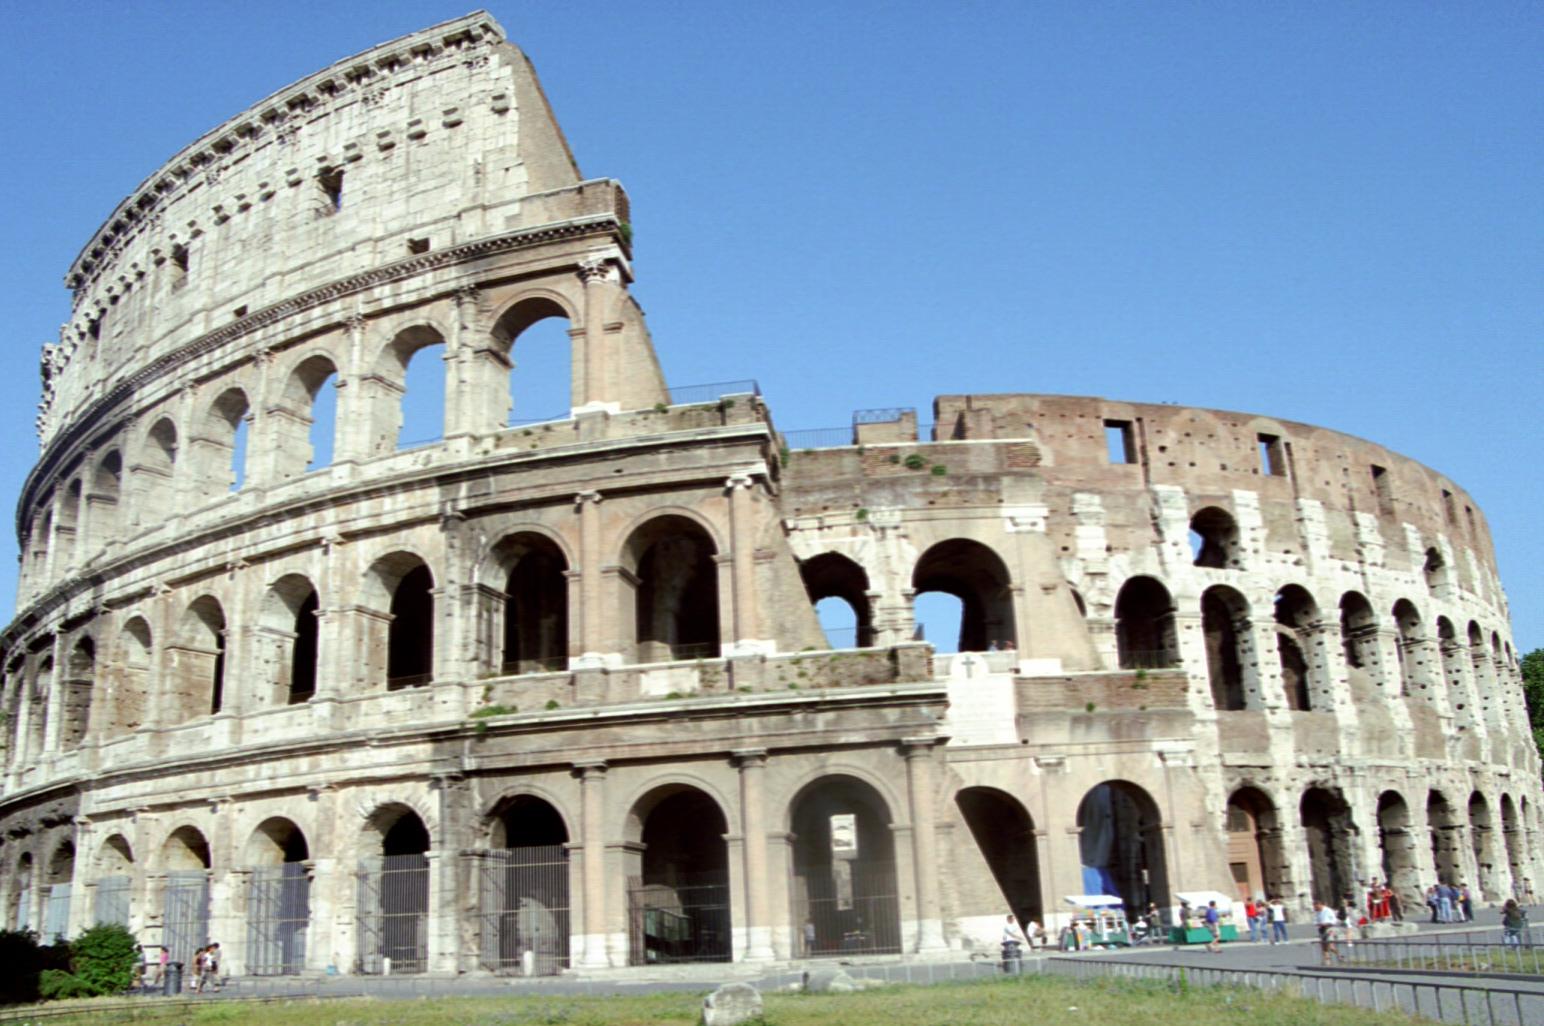 Colosseum of Rome.